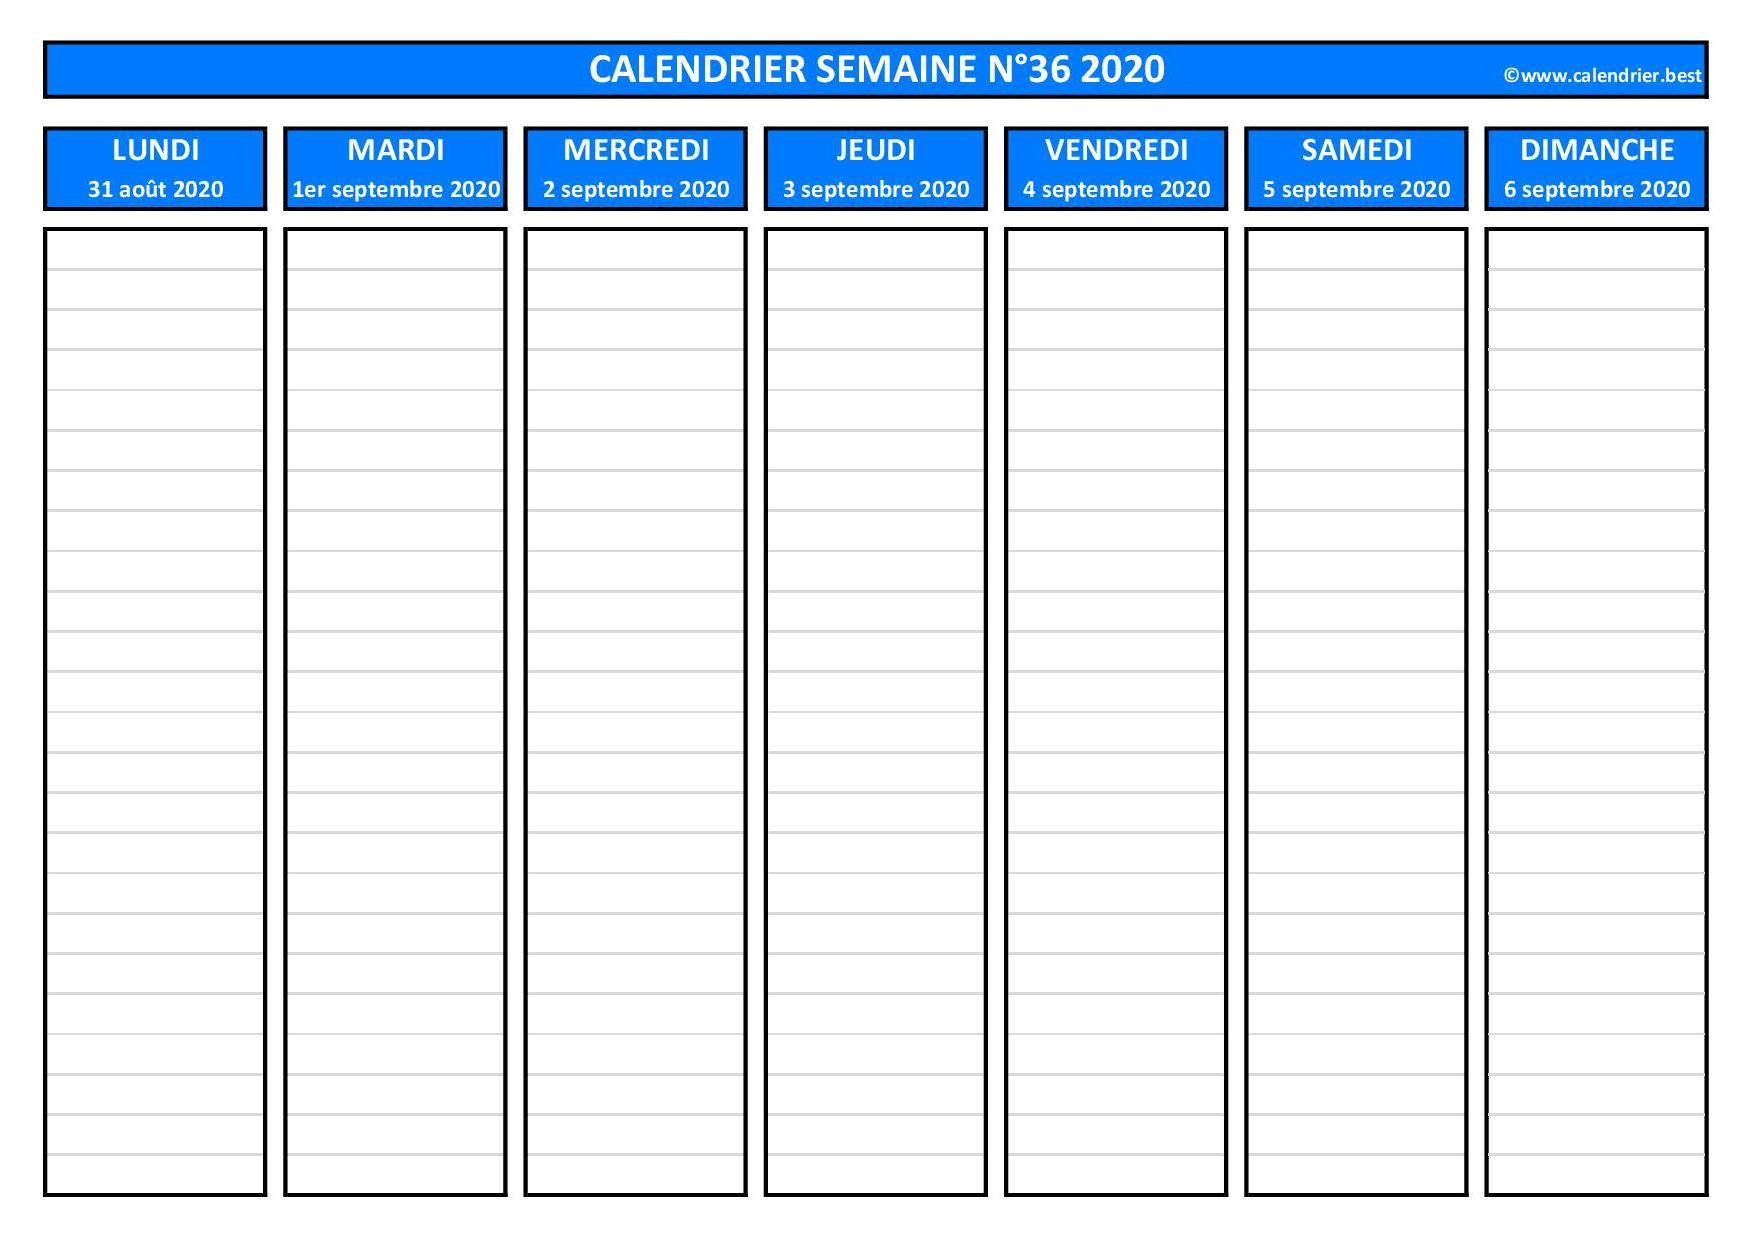 Semaine 36 2020 : dates, calendrier et planning  Calendrier.best